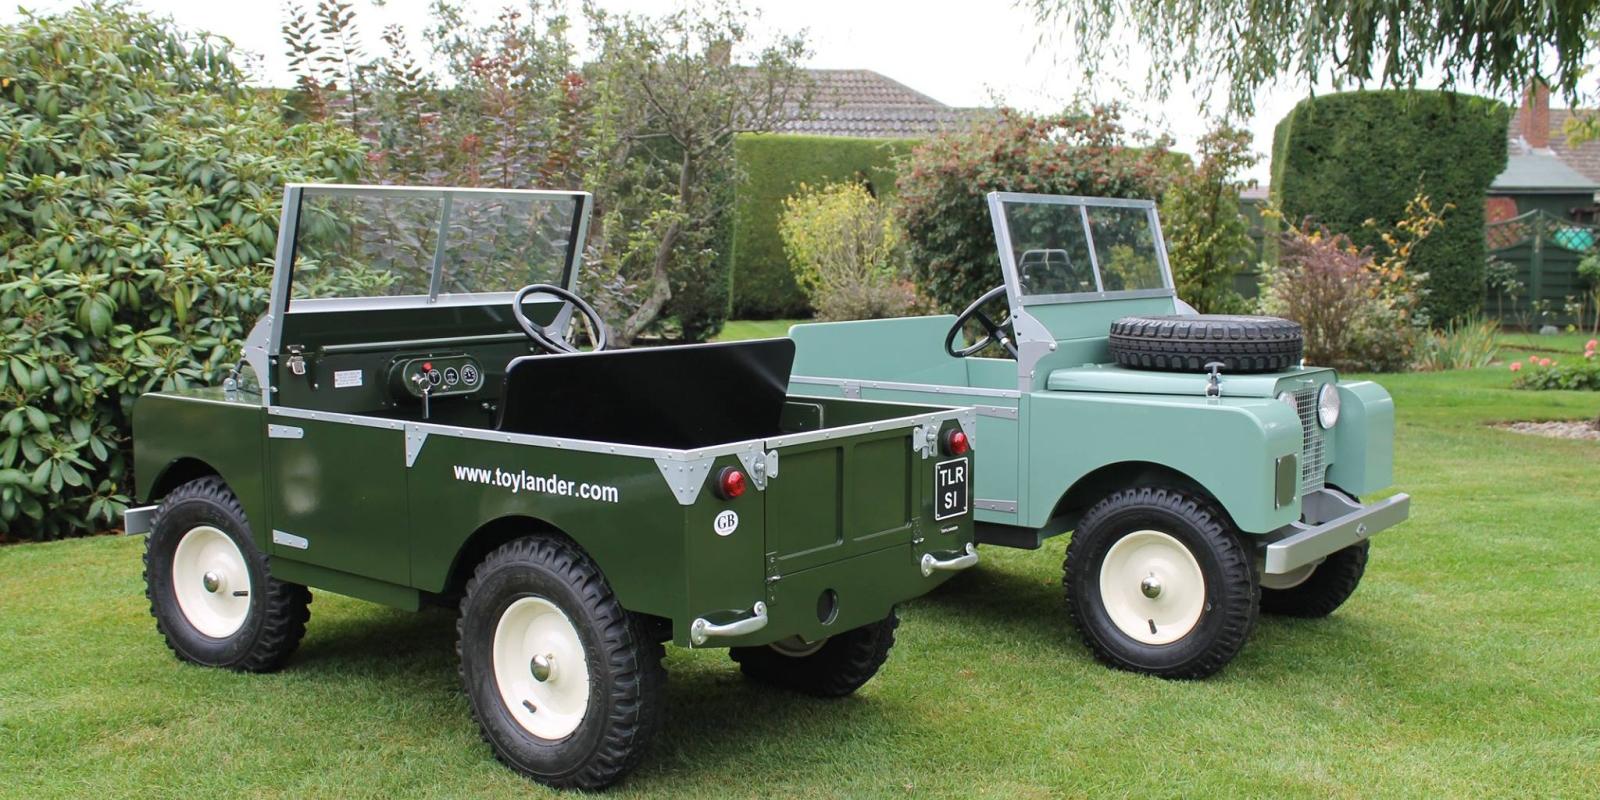 Toy Lander Land Rover 1